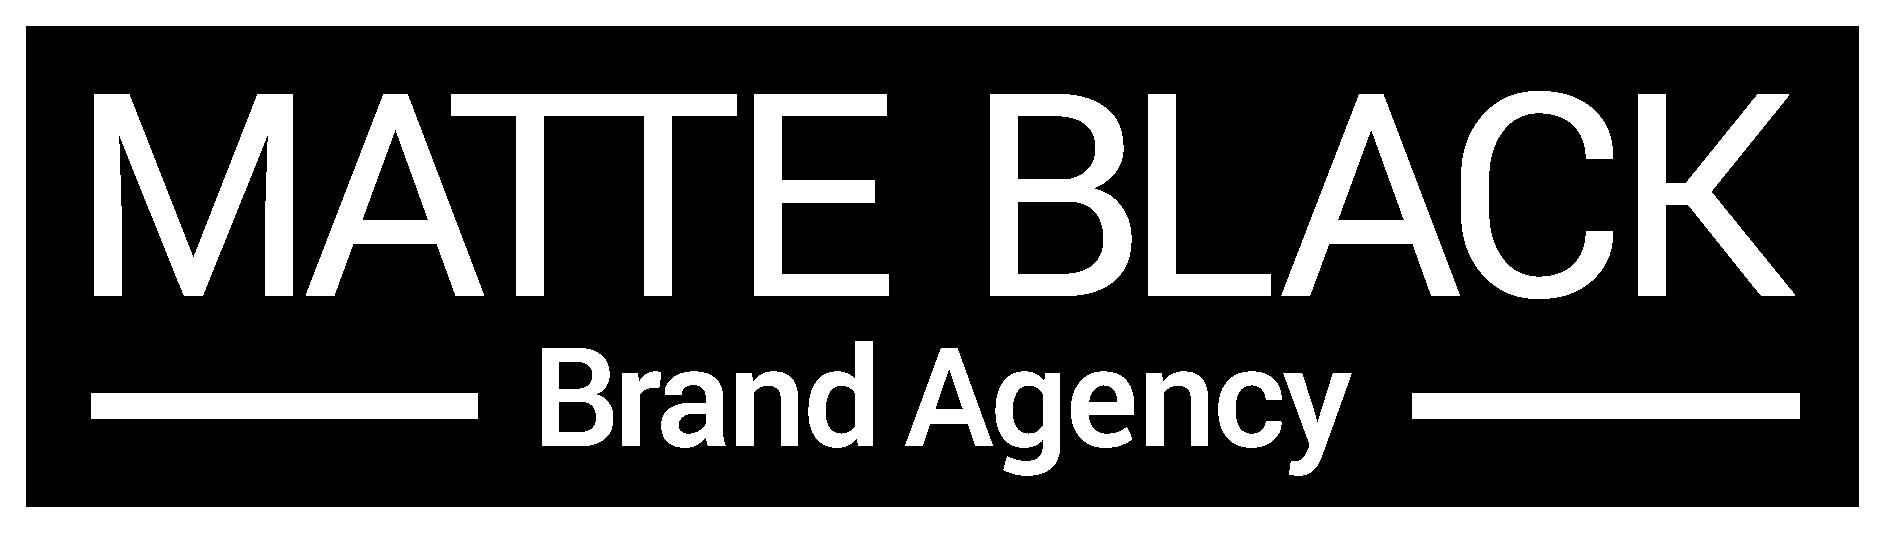 Matte Black Brand Agency Homepage